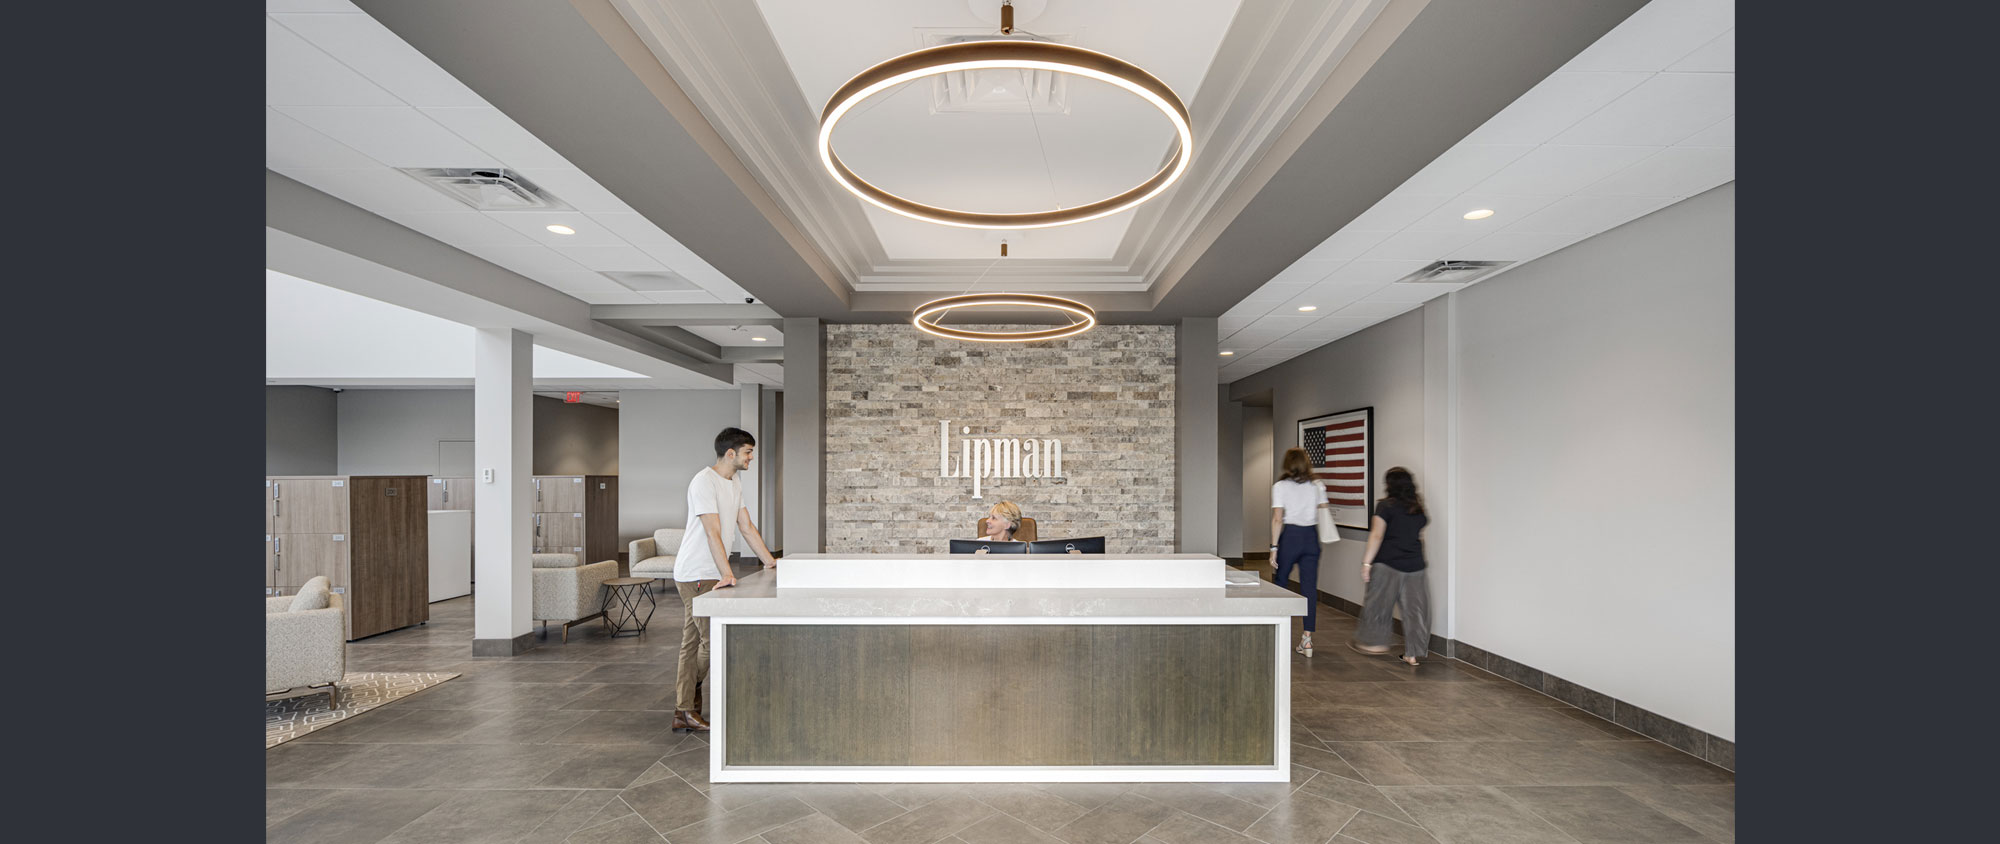 Lipman Brothers Office